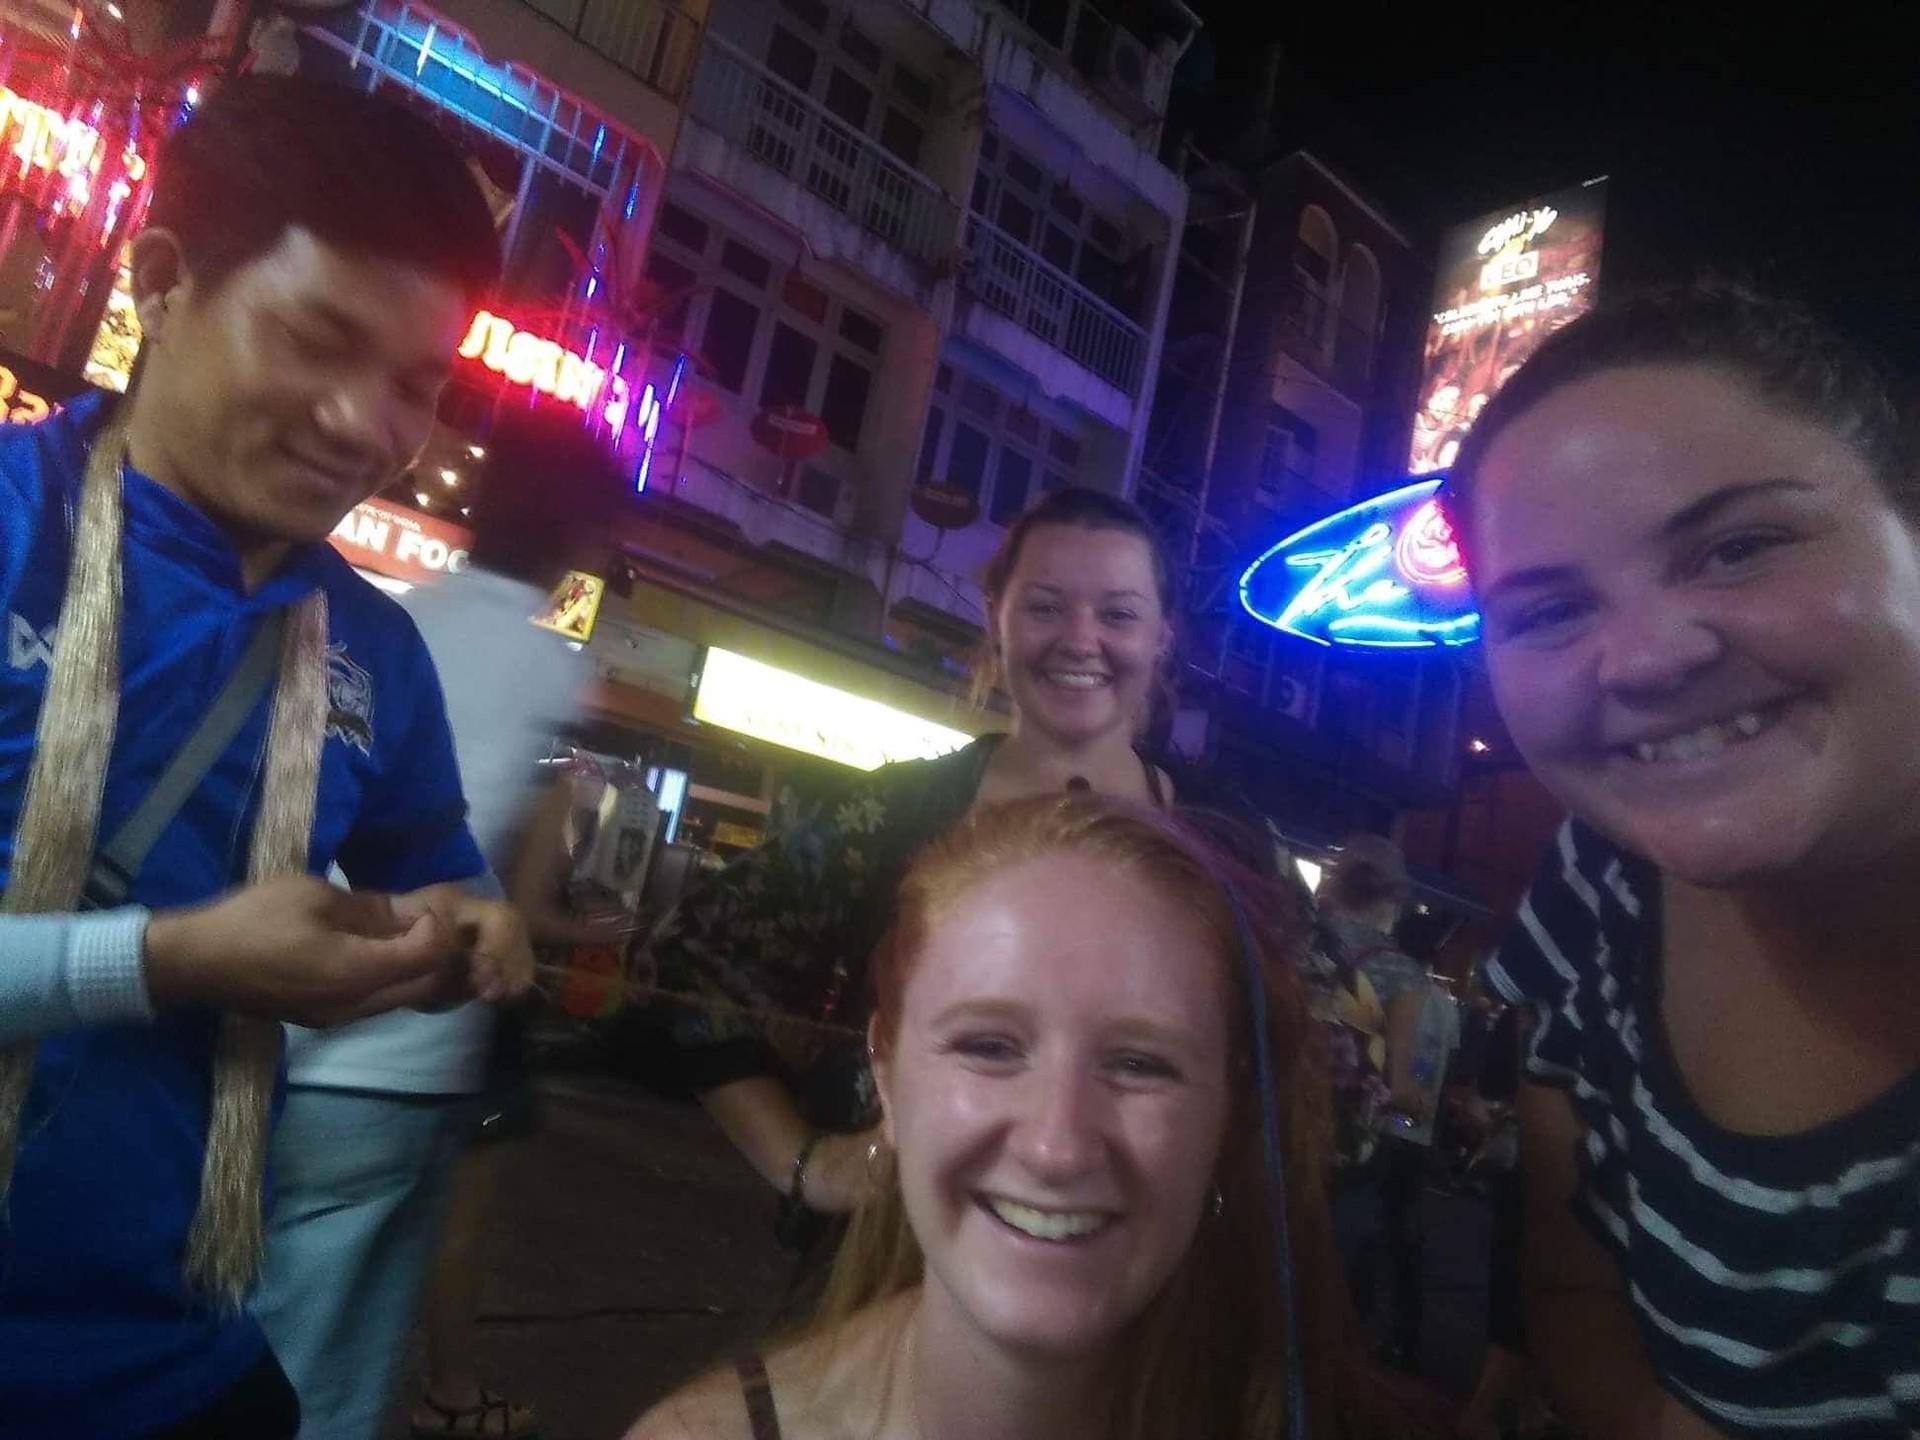 tet-holiday-phase-2-bangkok-eff4f2eb83da